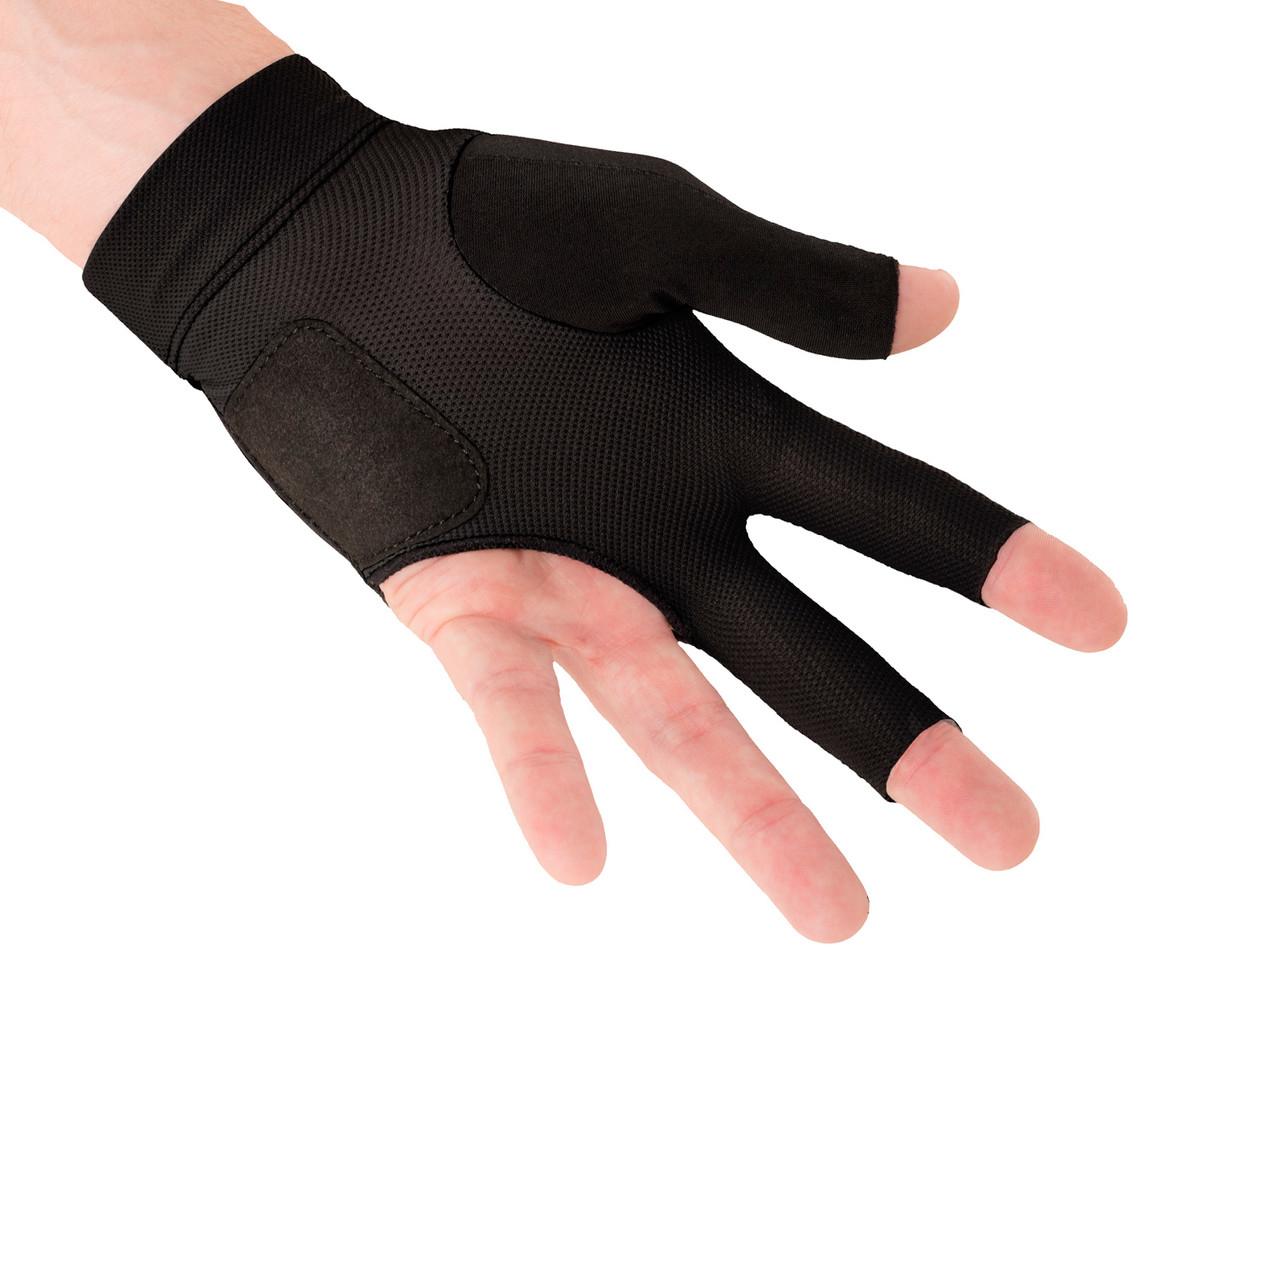 Predator Second Skin Pool Glove - Palm View